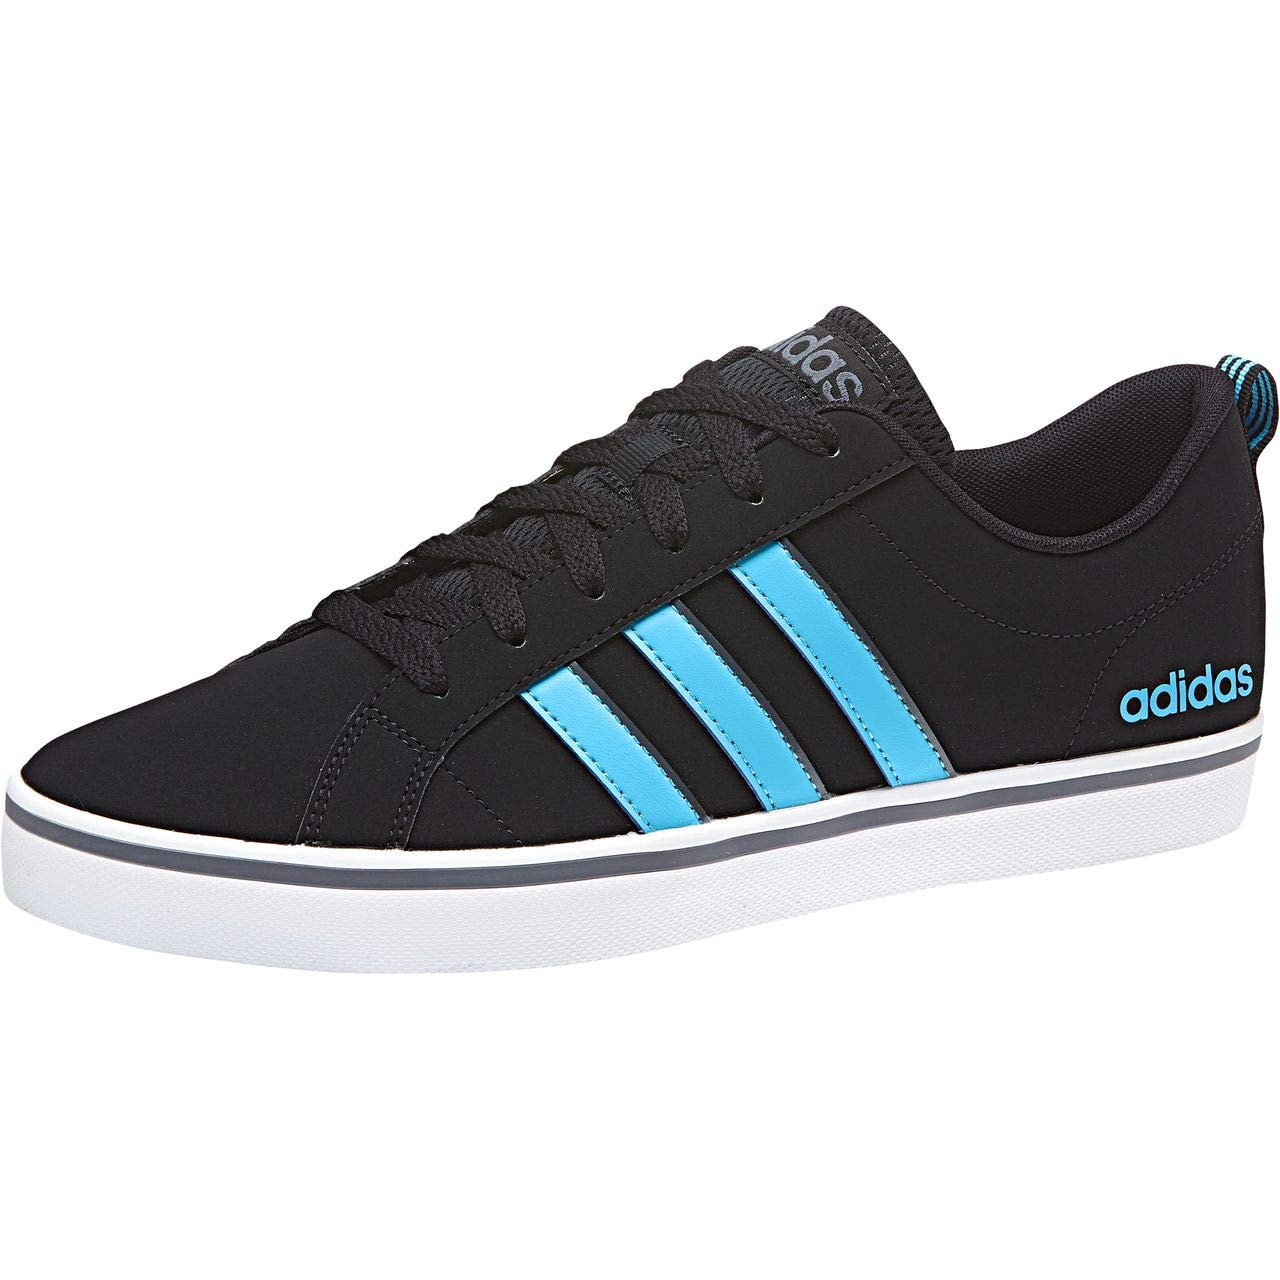 Adidas Vs Pace, Chaussures de Fitness Fitness de Homme 40 2/3 EU|Noir (Core Black/Bright Cyan/Onix) 4ceee4